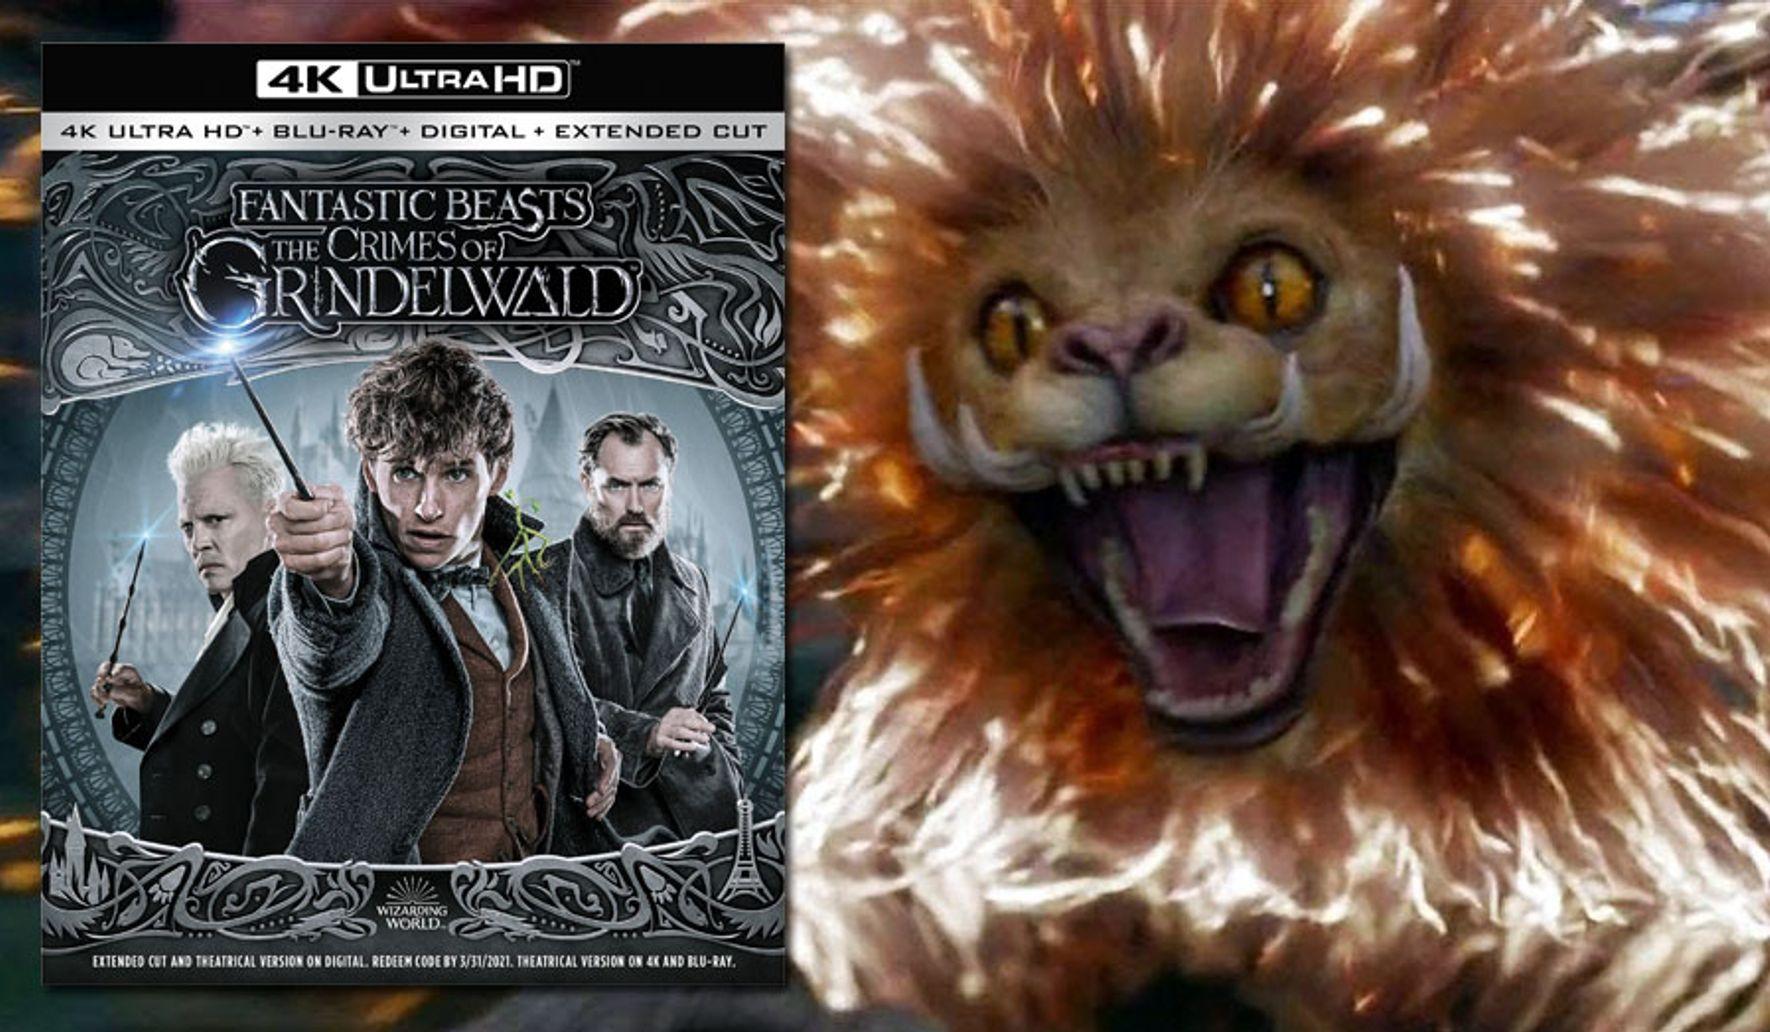 Fantastic Beasts: The Crimes of Grindelwald' 4K Ultra HD